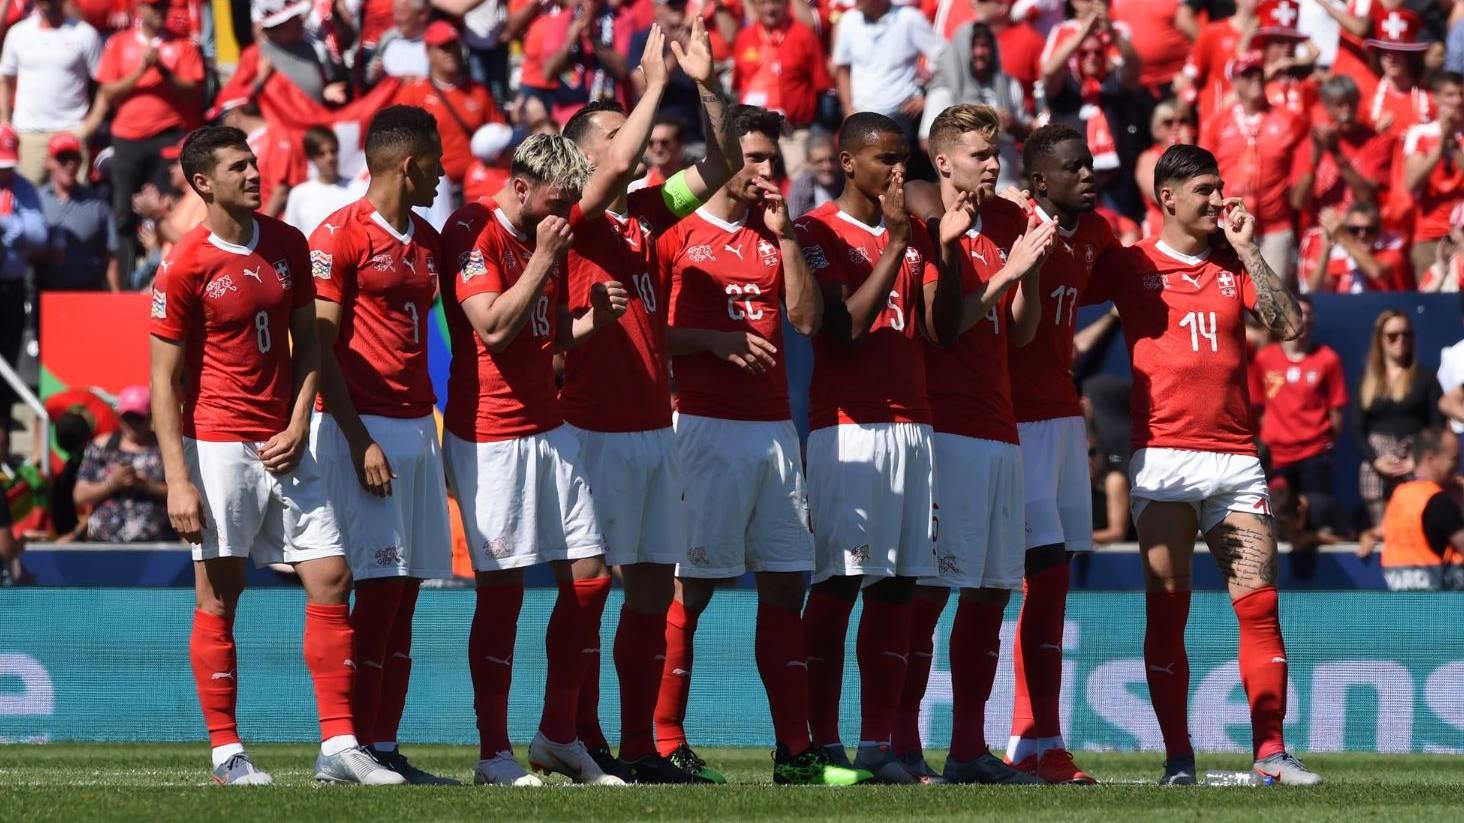 Die Schweiz verliert gegen England